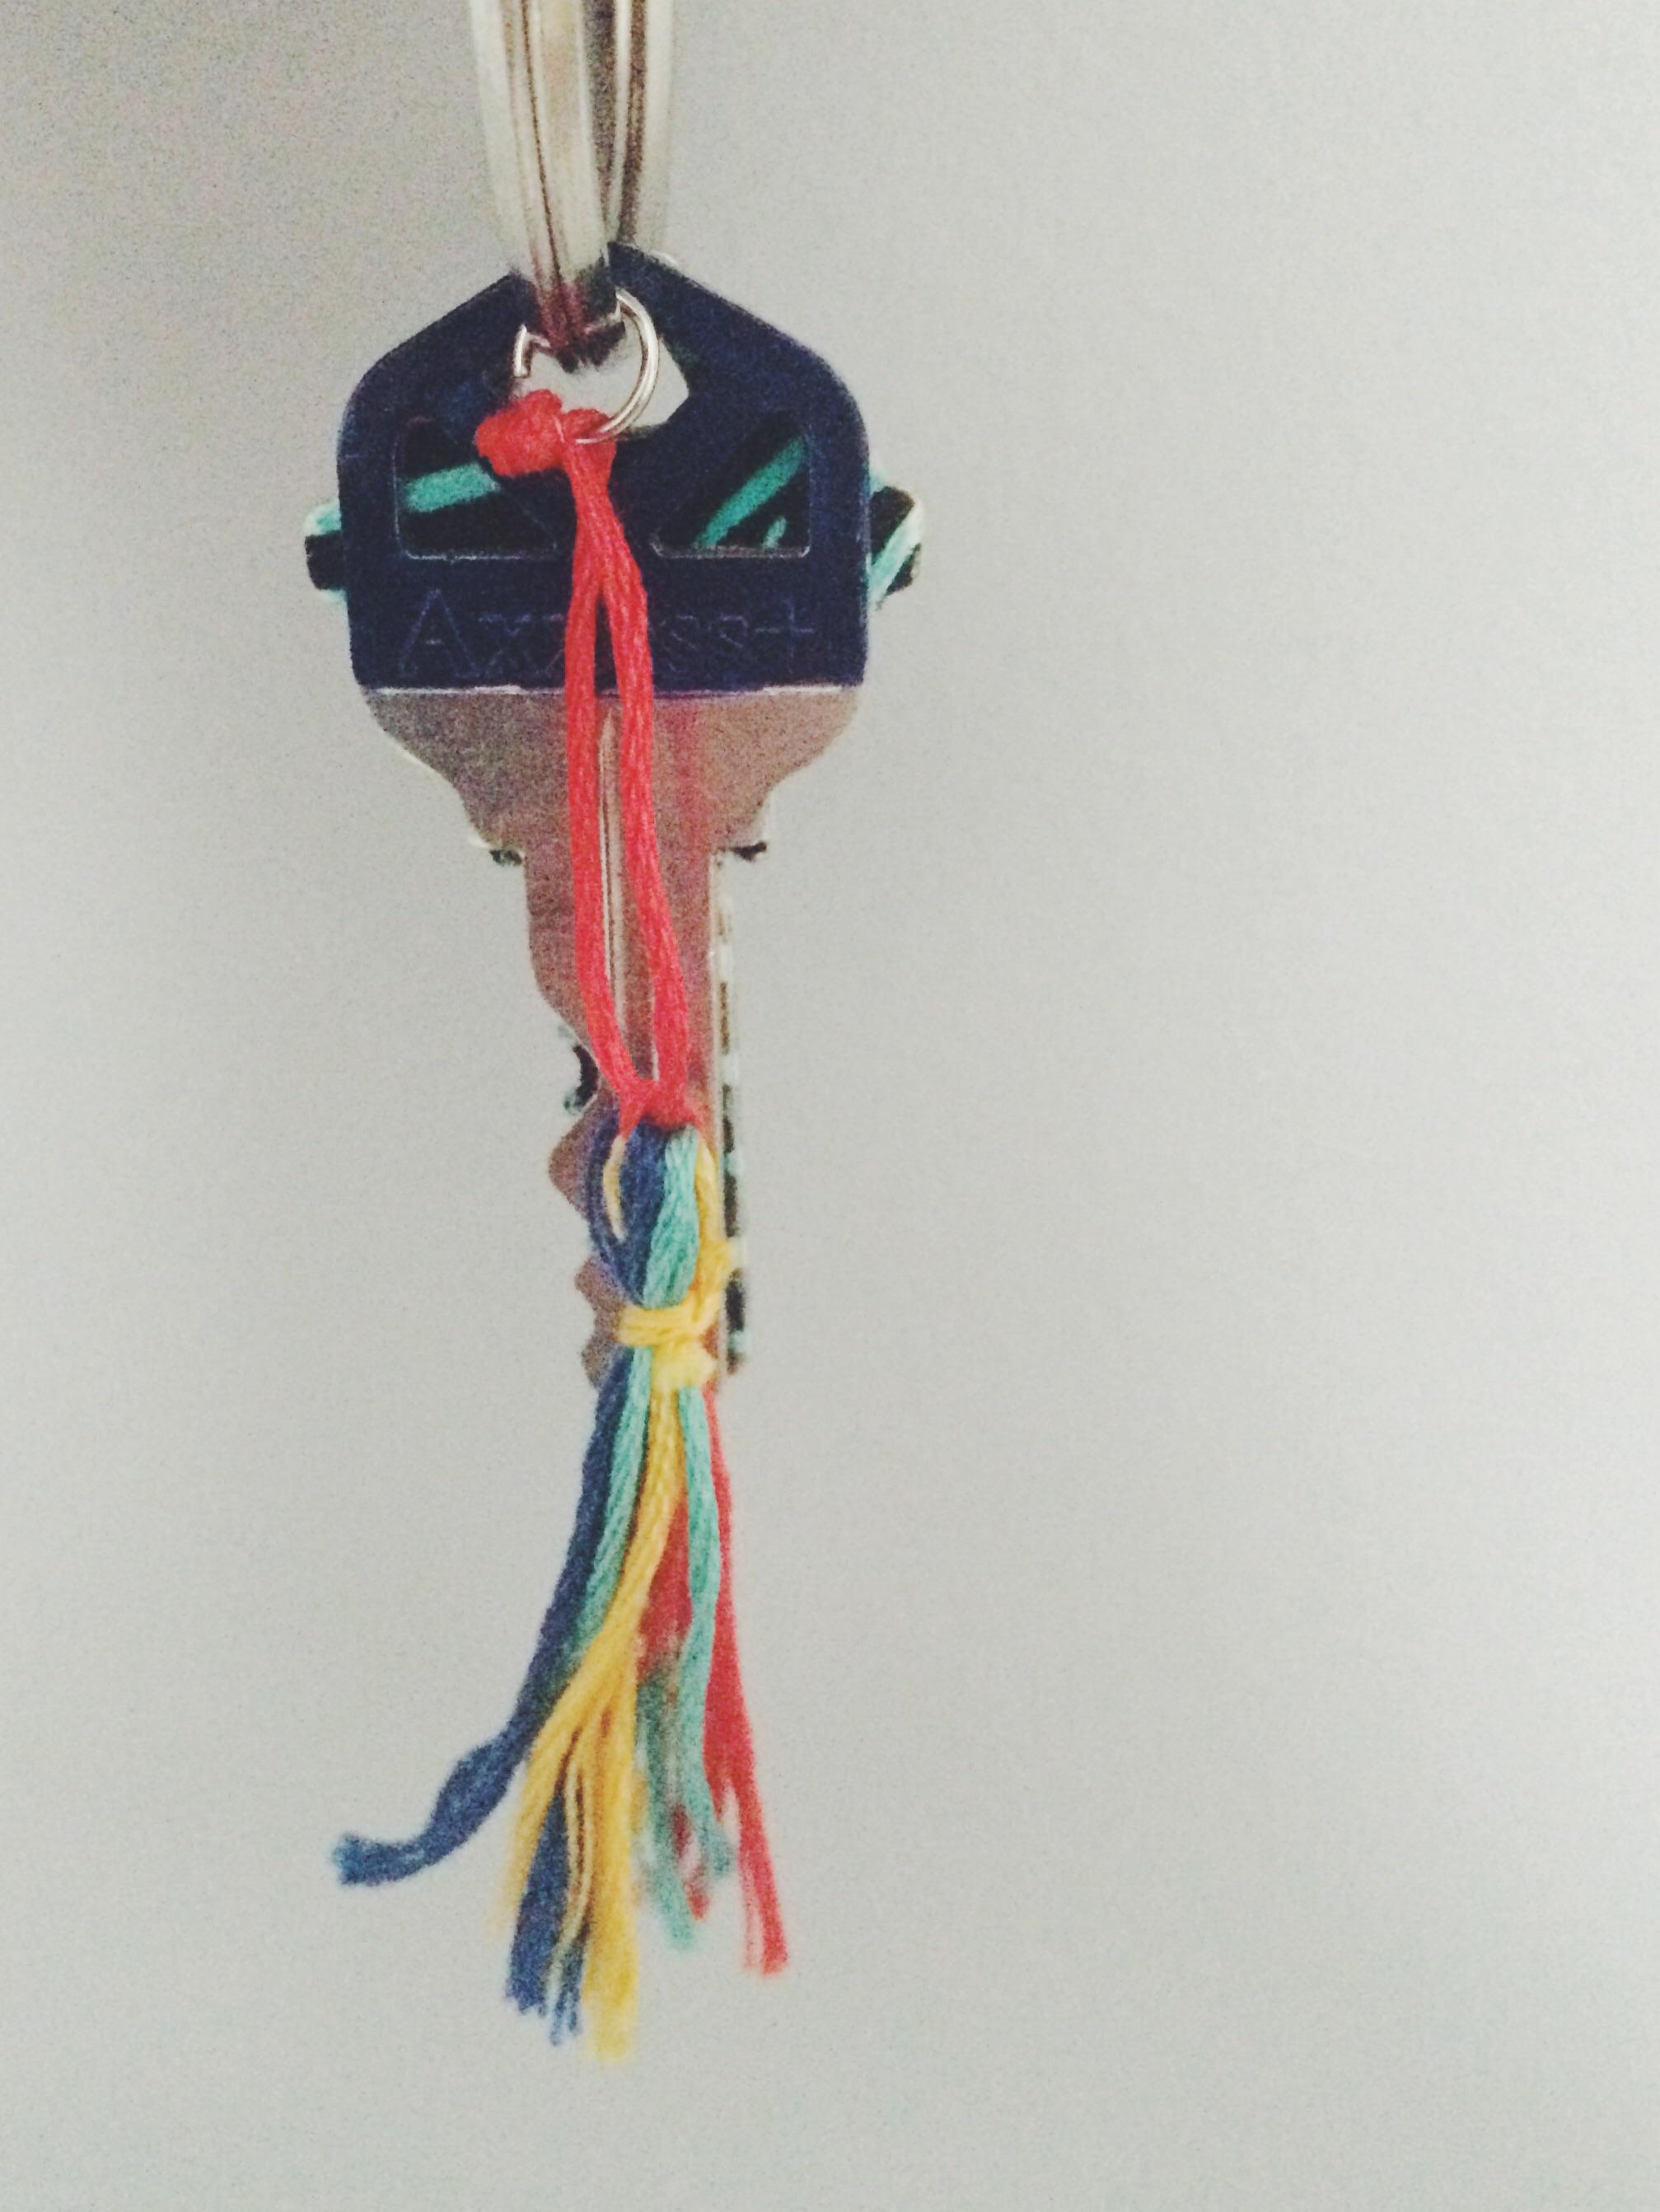 Diy Tassel Key Chain. Click through for details.